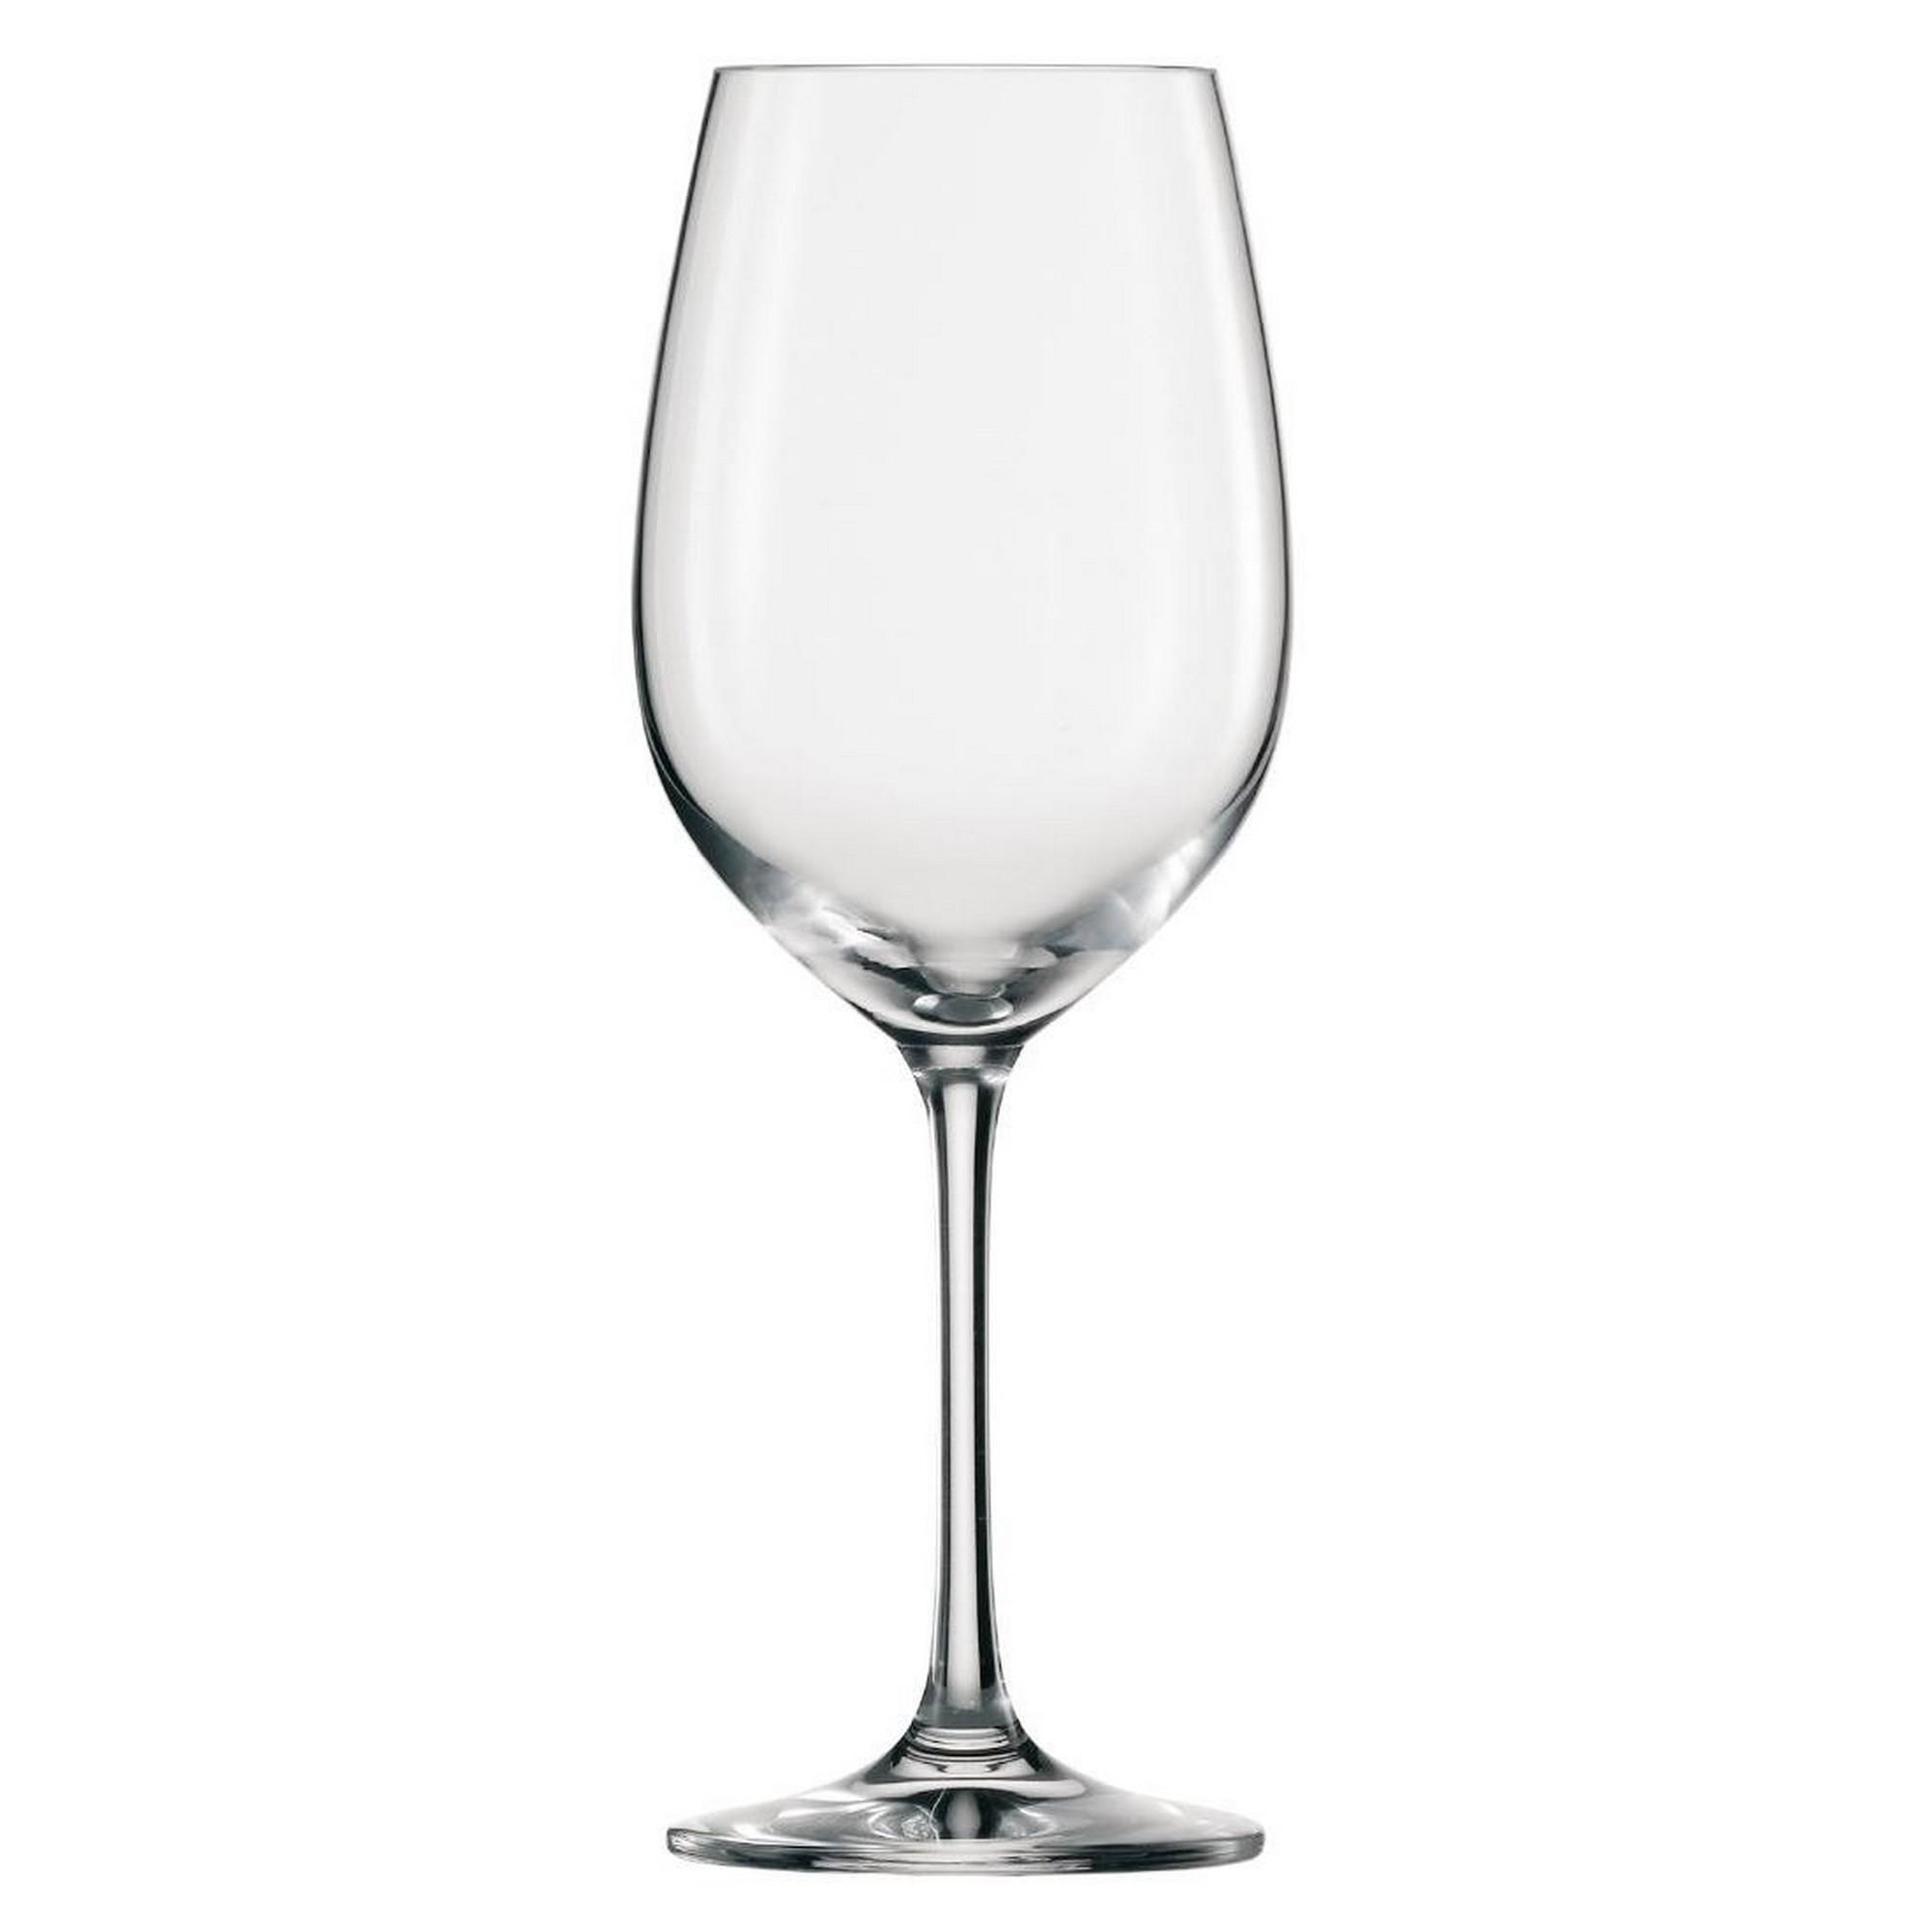 Taça para Vinho Branco 349ml Schott Zwiesel Ivento 6 Peças de Cristal